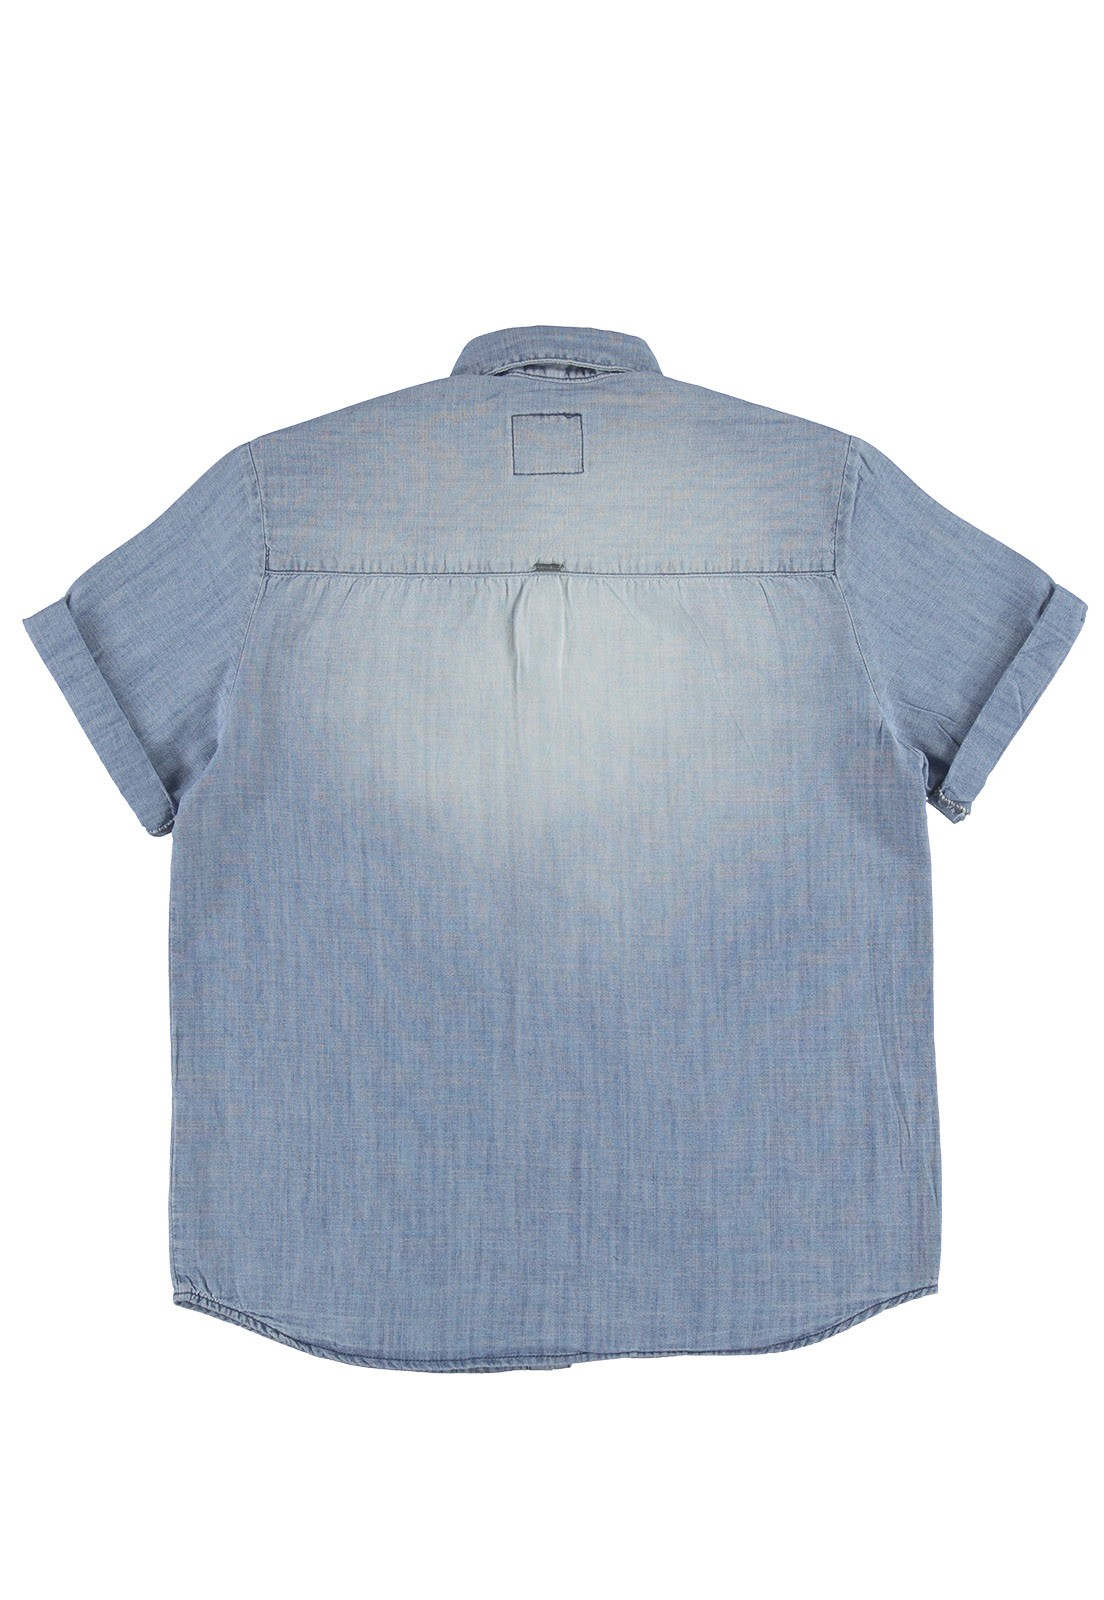 Camisa Crawling Jeans Masculina Manga Curta